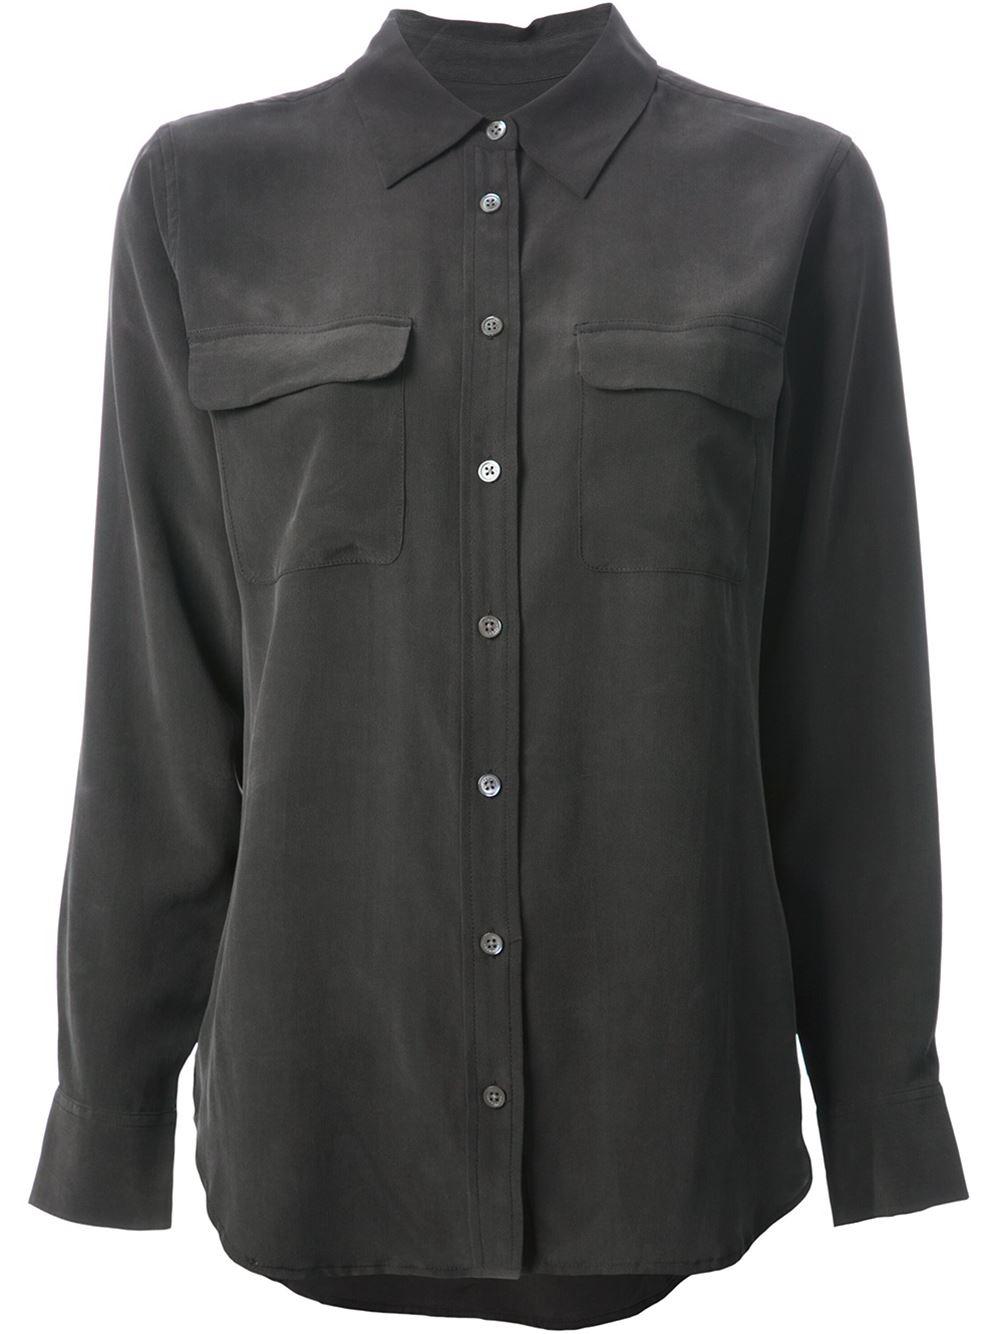 Lyst equipment silk shirt women silk l in black for Equipment black silk shirt